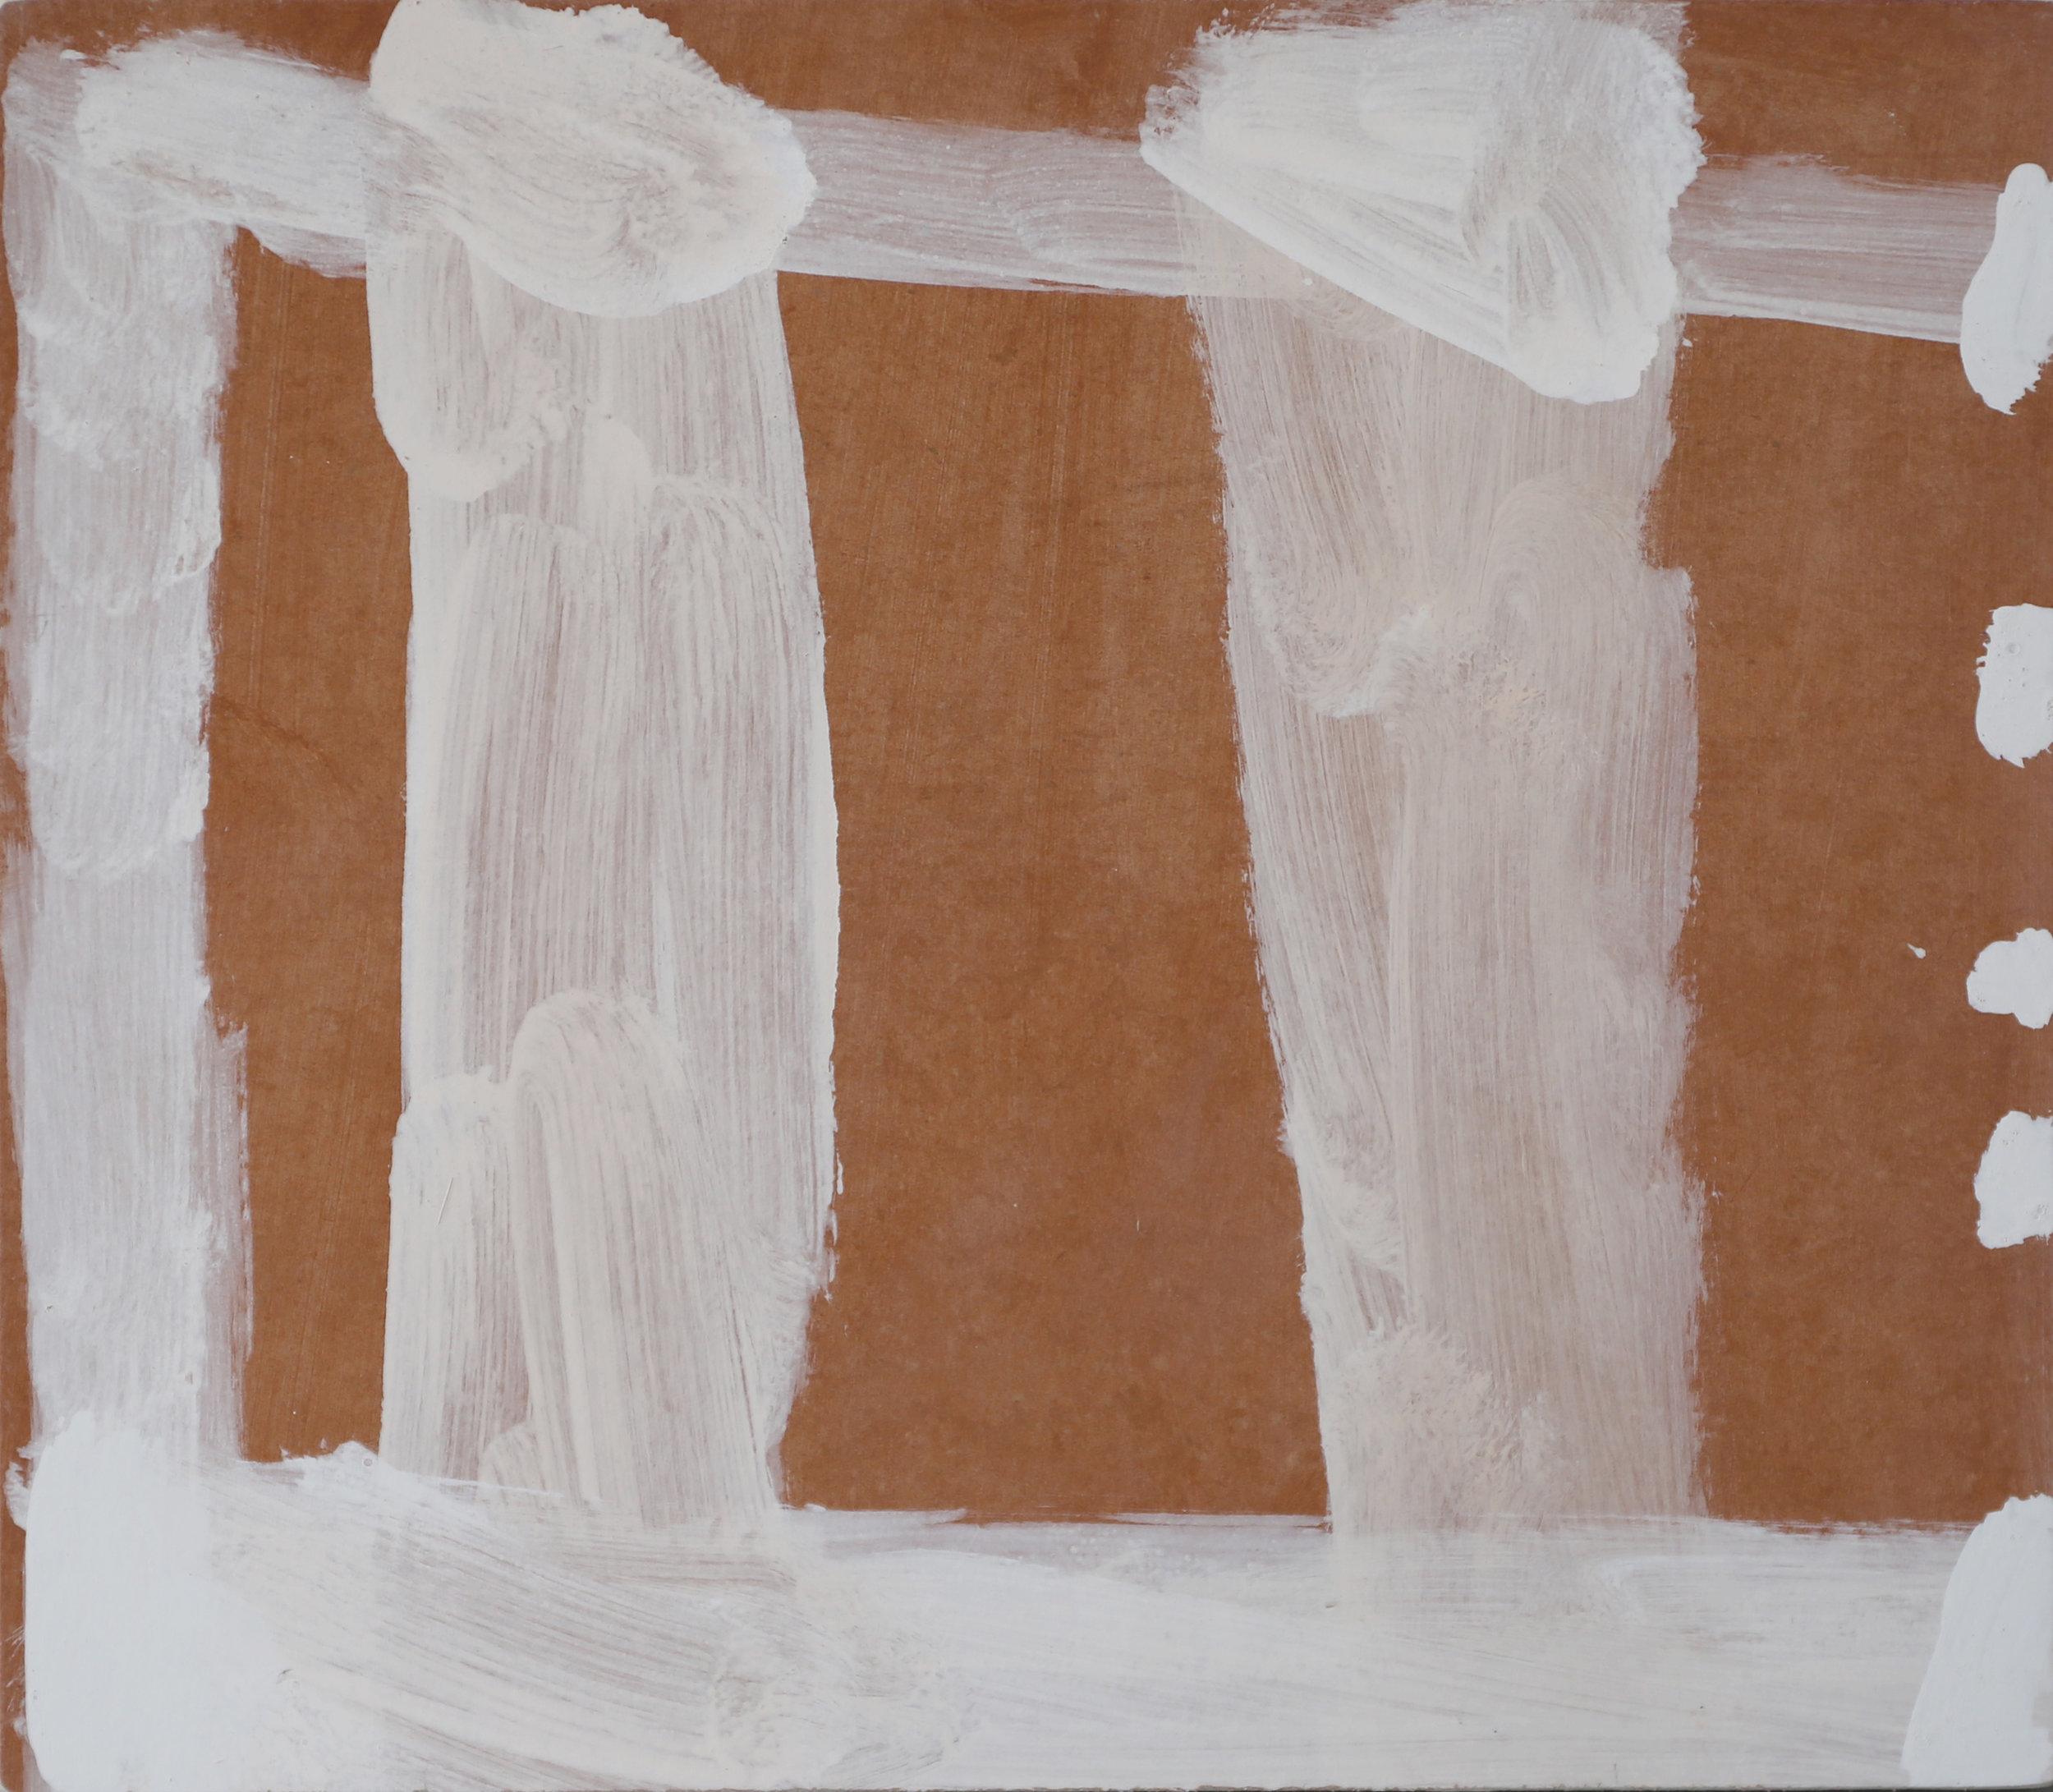 STEVEN HARVEY  Unrendered Room - Wingecarribee , 2016 acrylic on compressed cement 40 x 45 cm